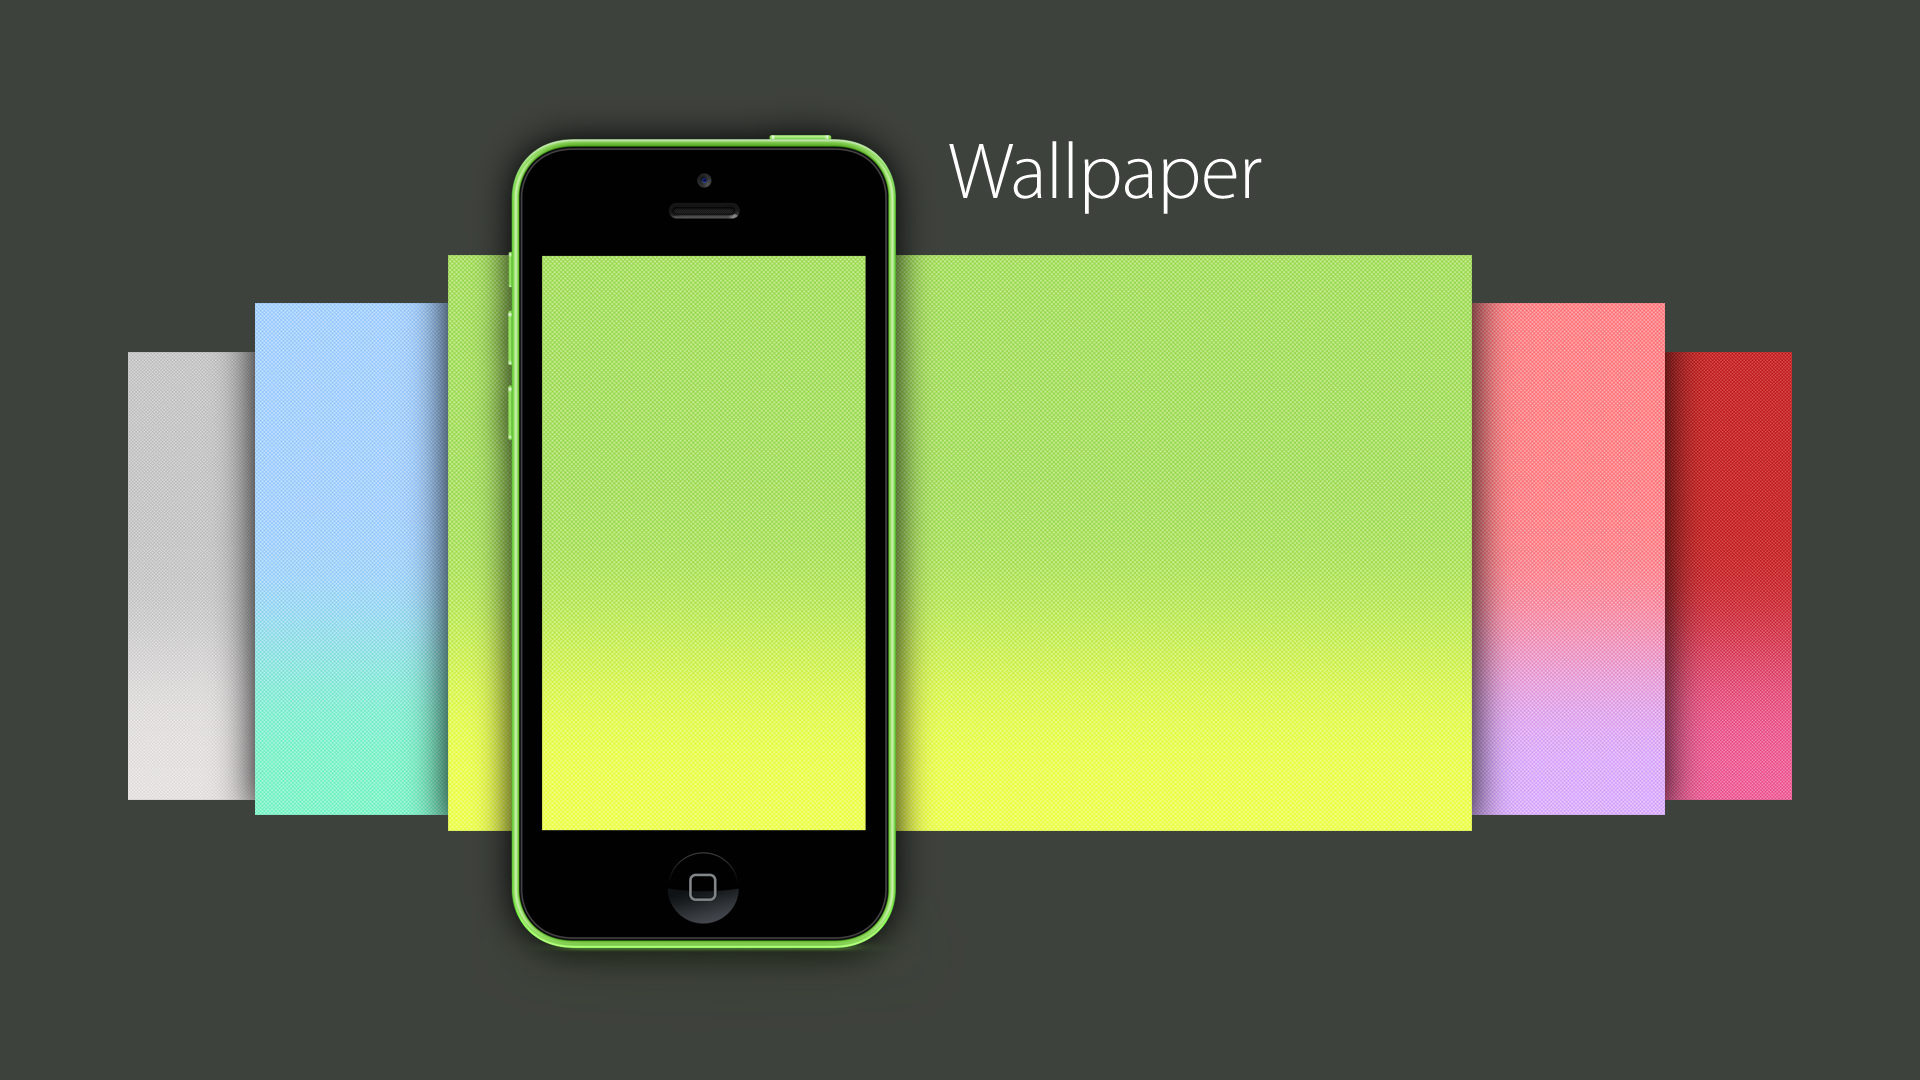 50 Iphone 5c Wallpapers On Wallpapersafari